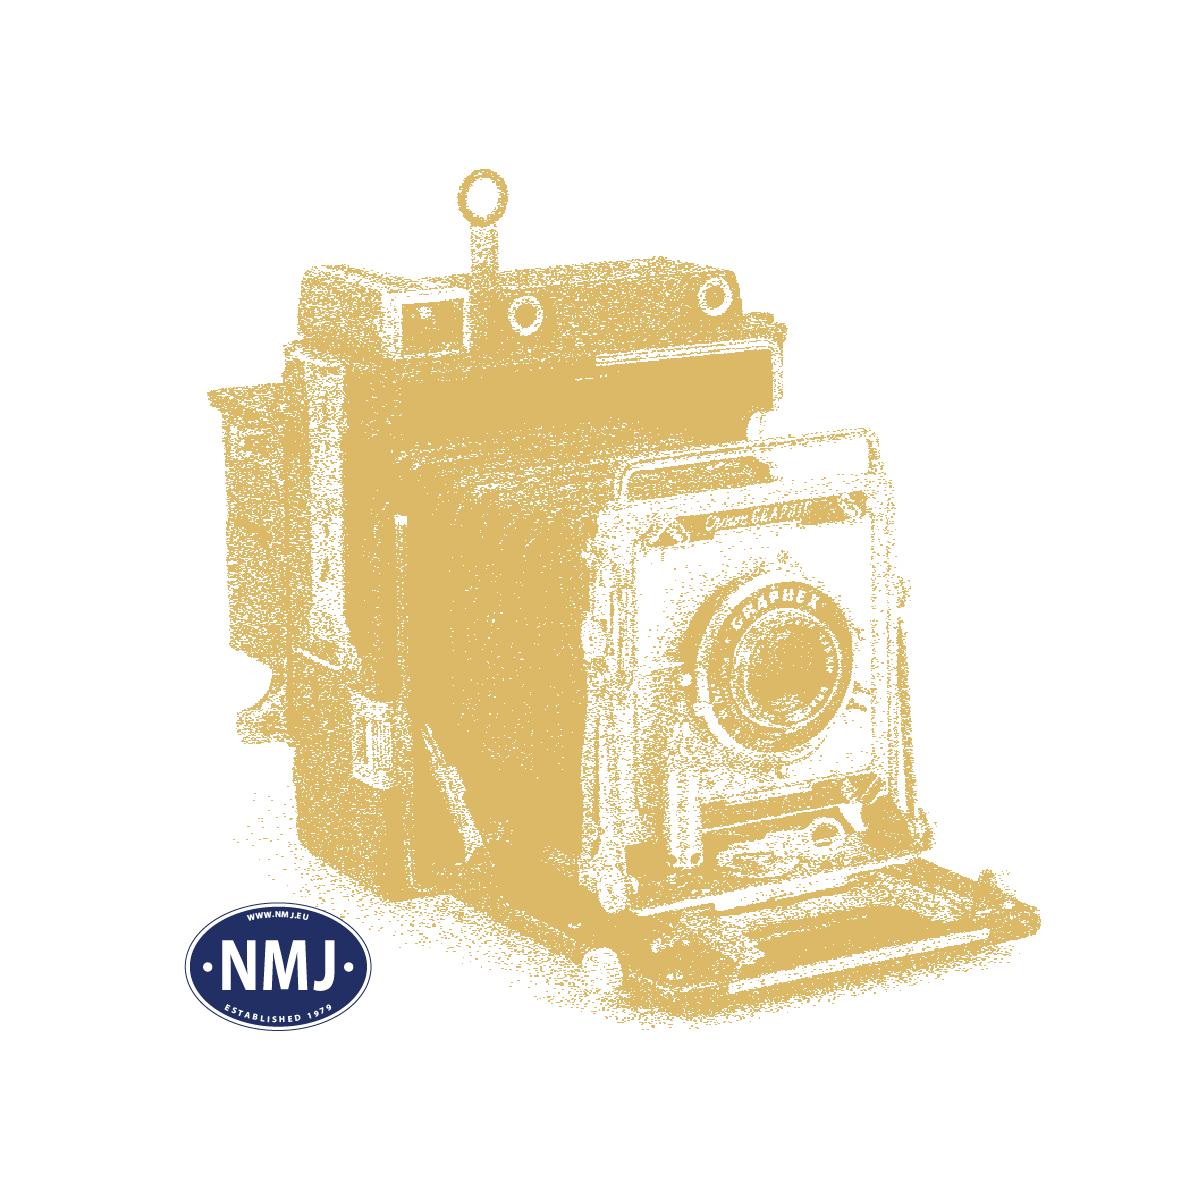 NMJT106.301 - NMJ Topline NSB B3 25540 Nydesign